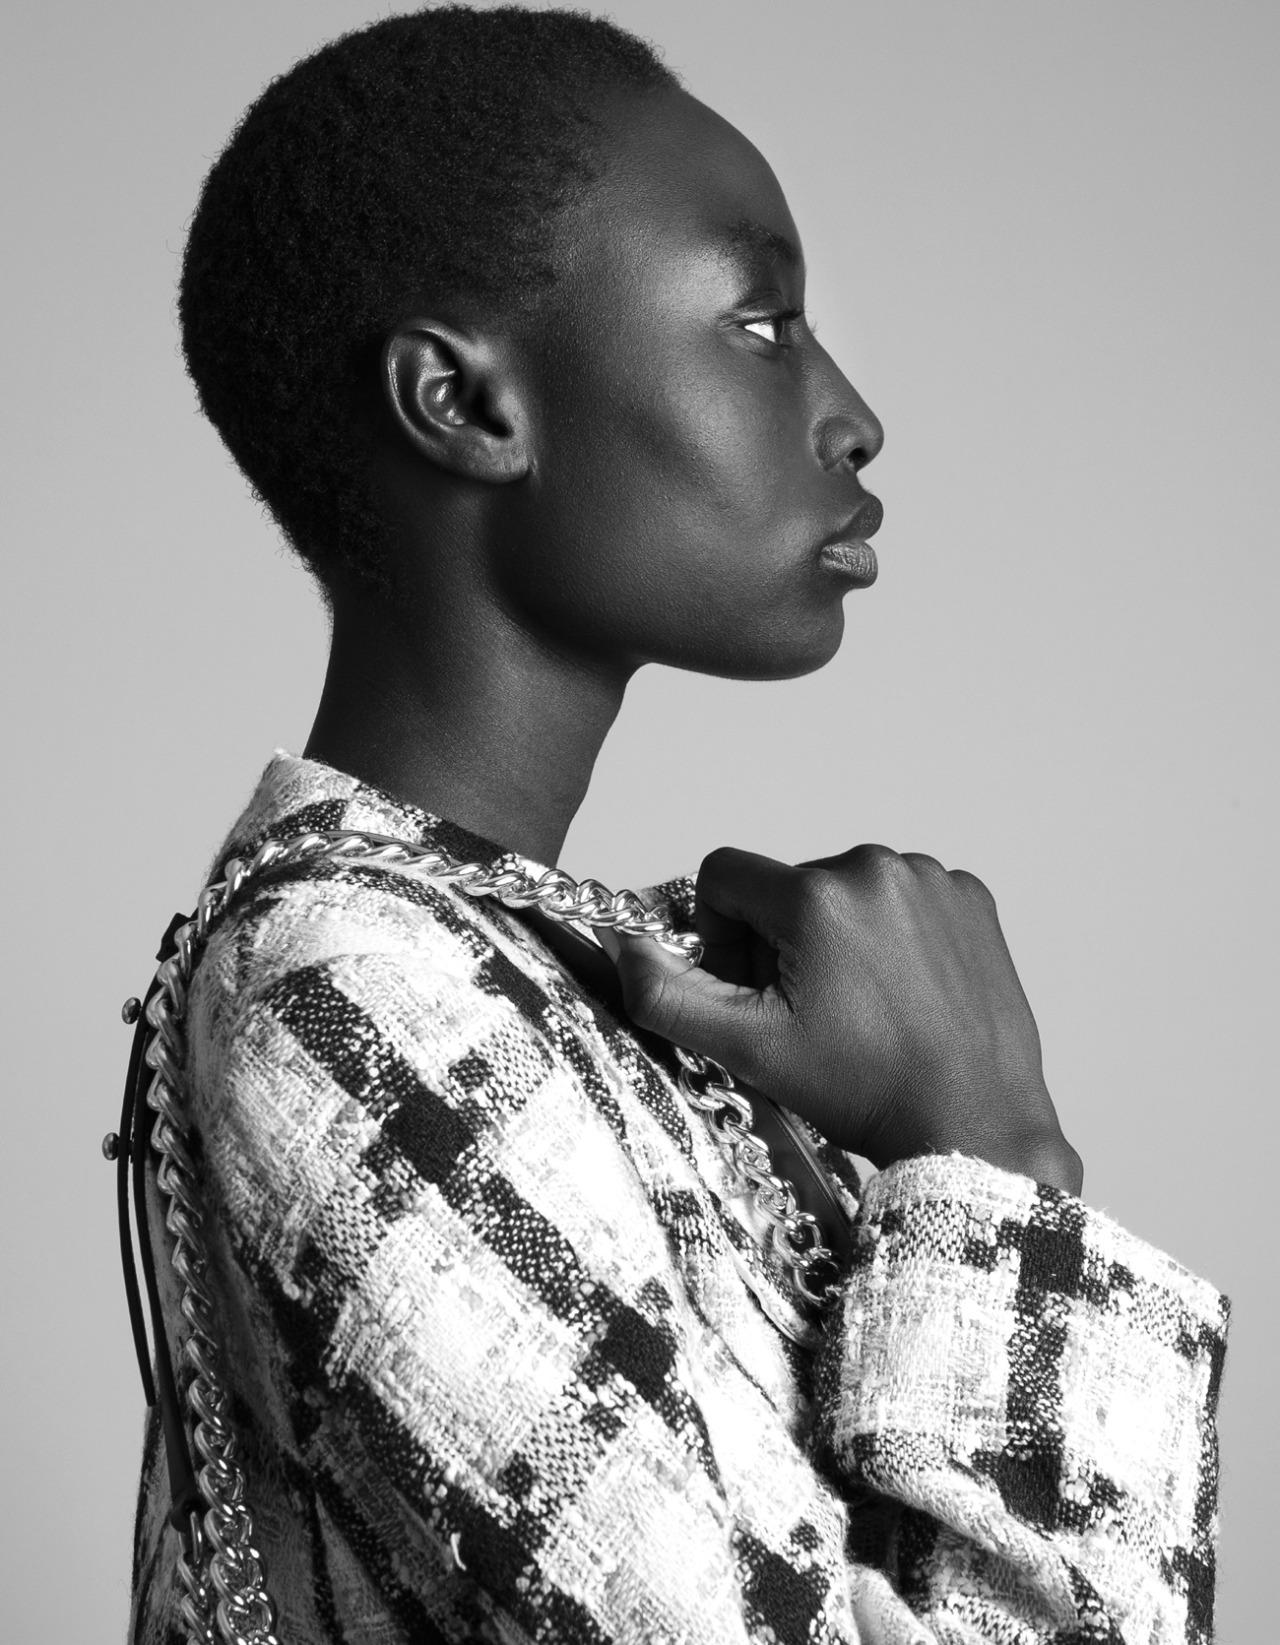 Nyagua by Baldovino Barani #baldovino barani#chanel#tweed#nyagua ruea